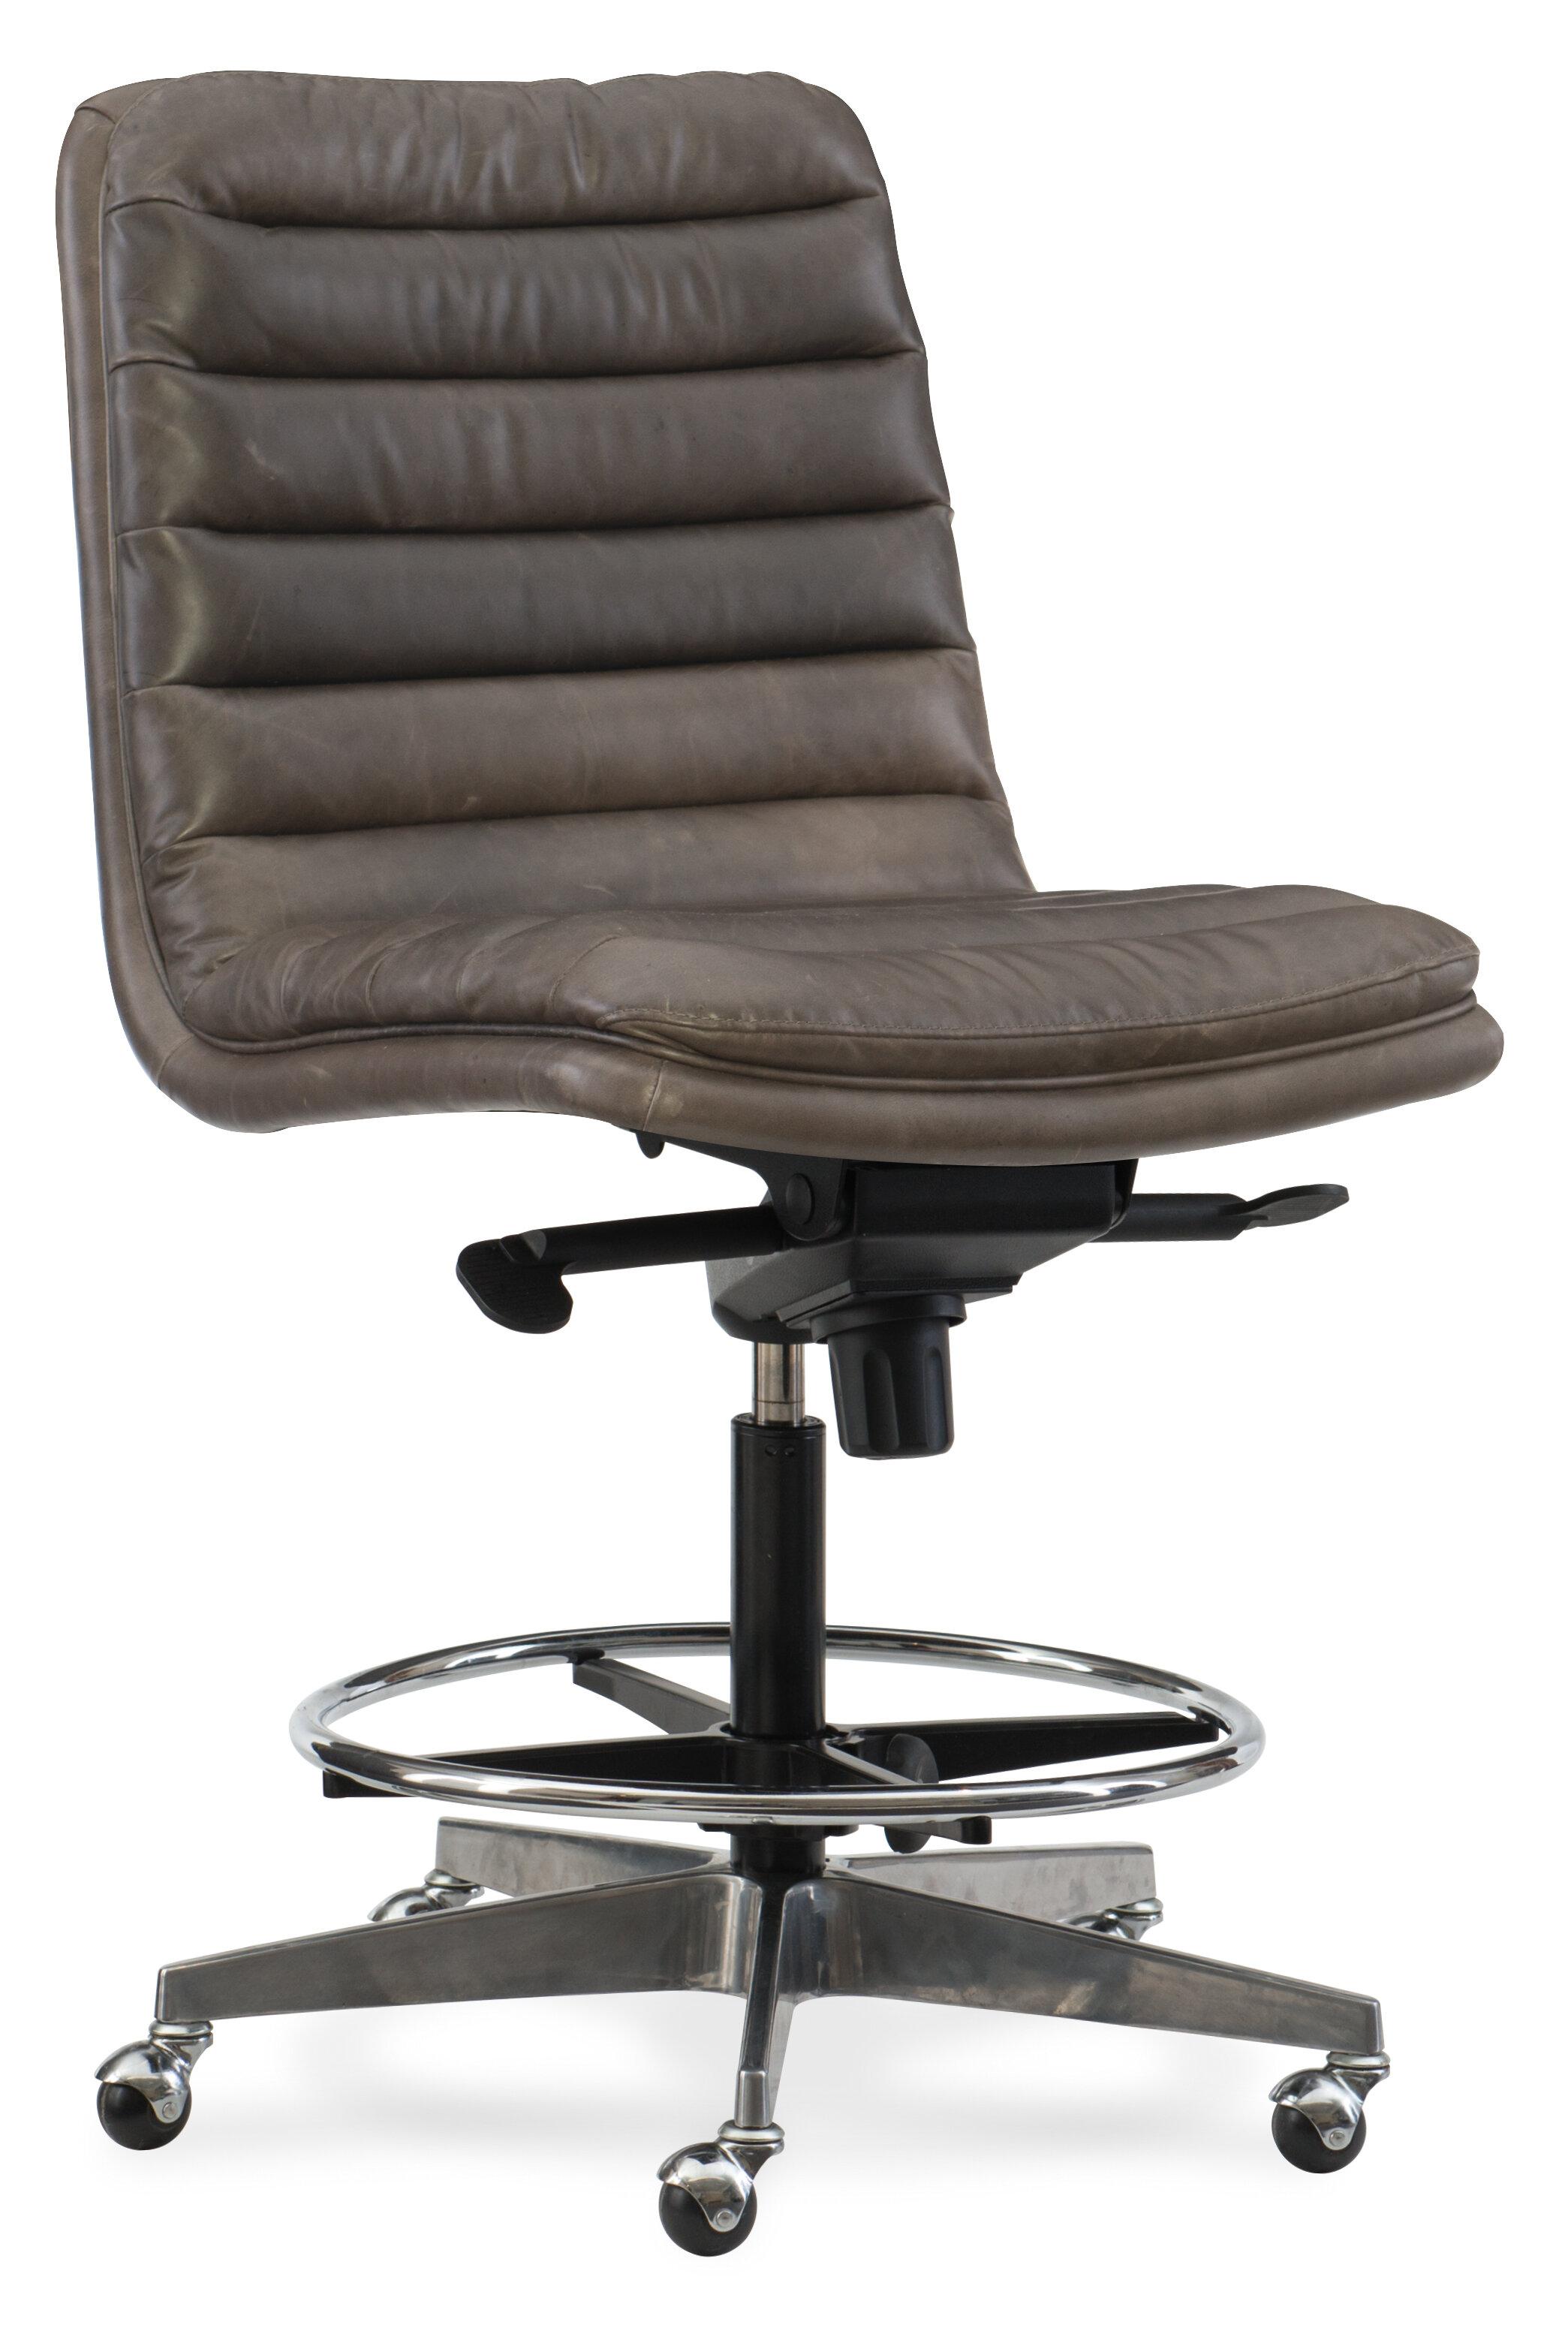 Hooker furniture wyatt home office high back leather office chair wayfair